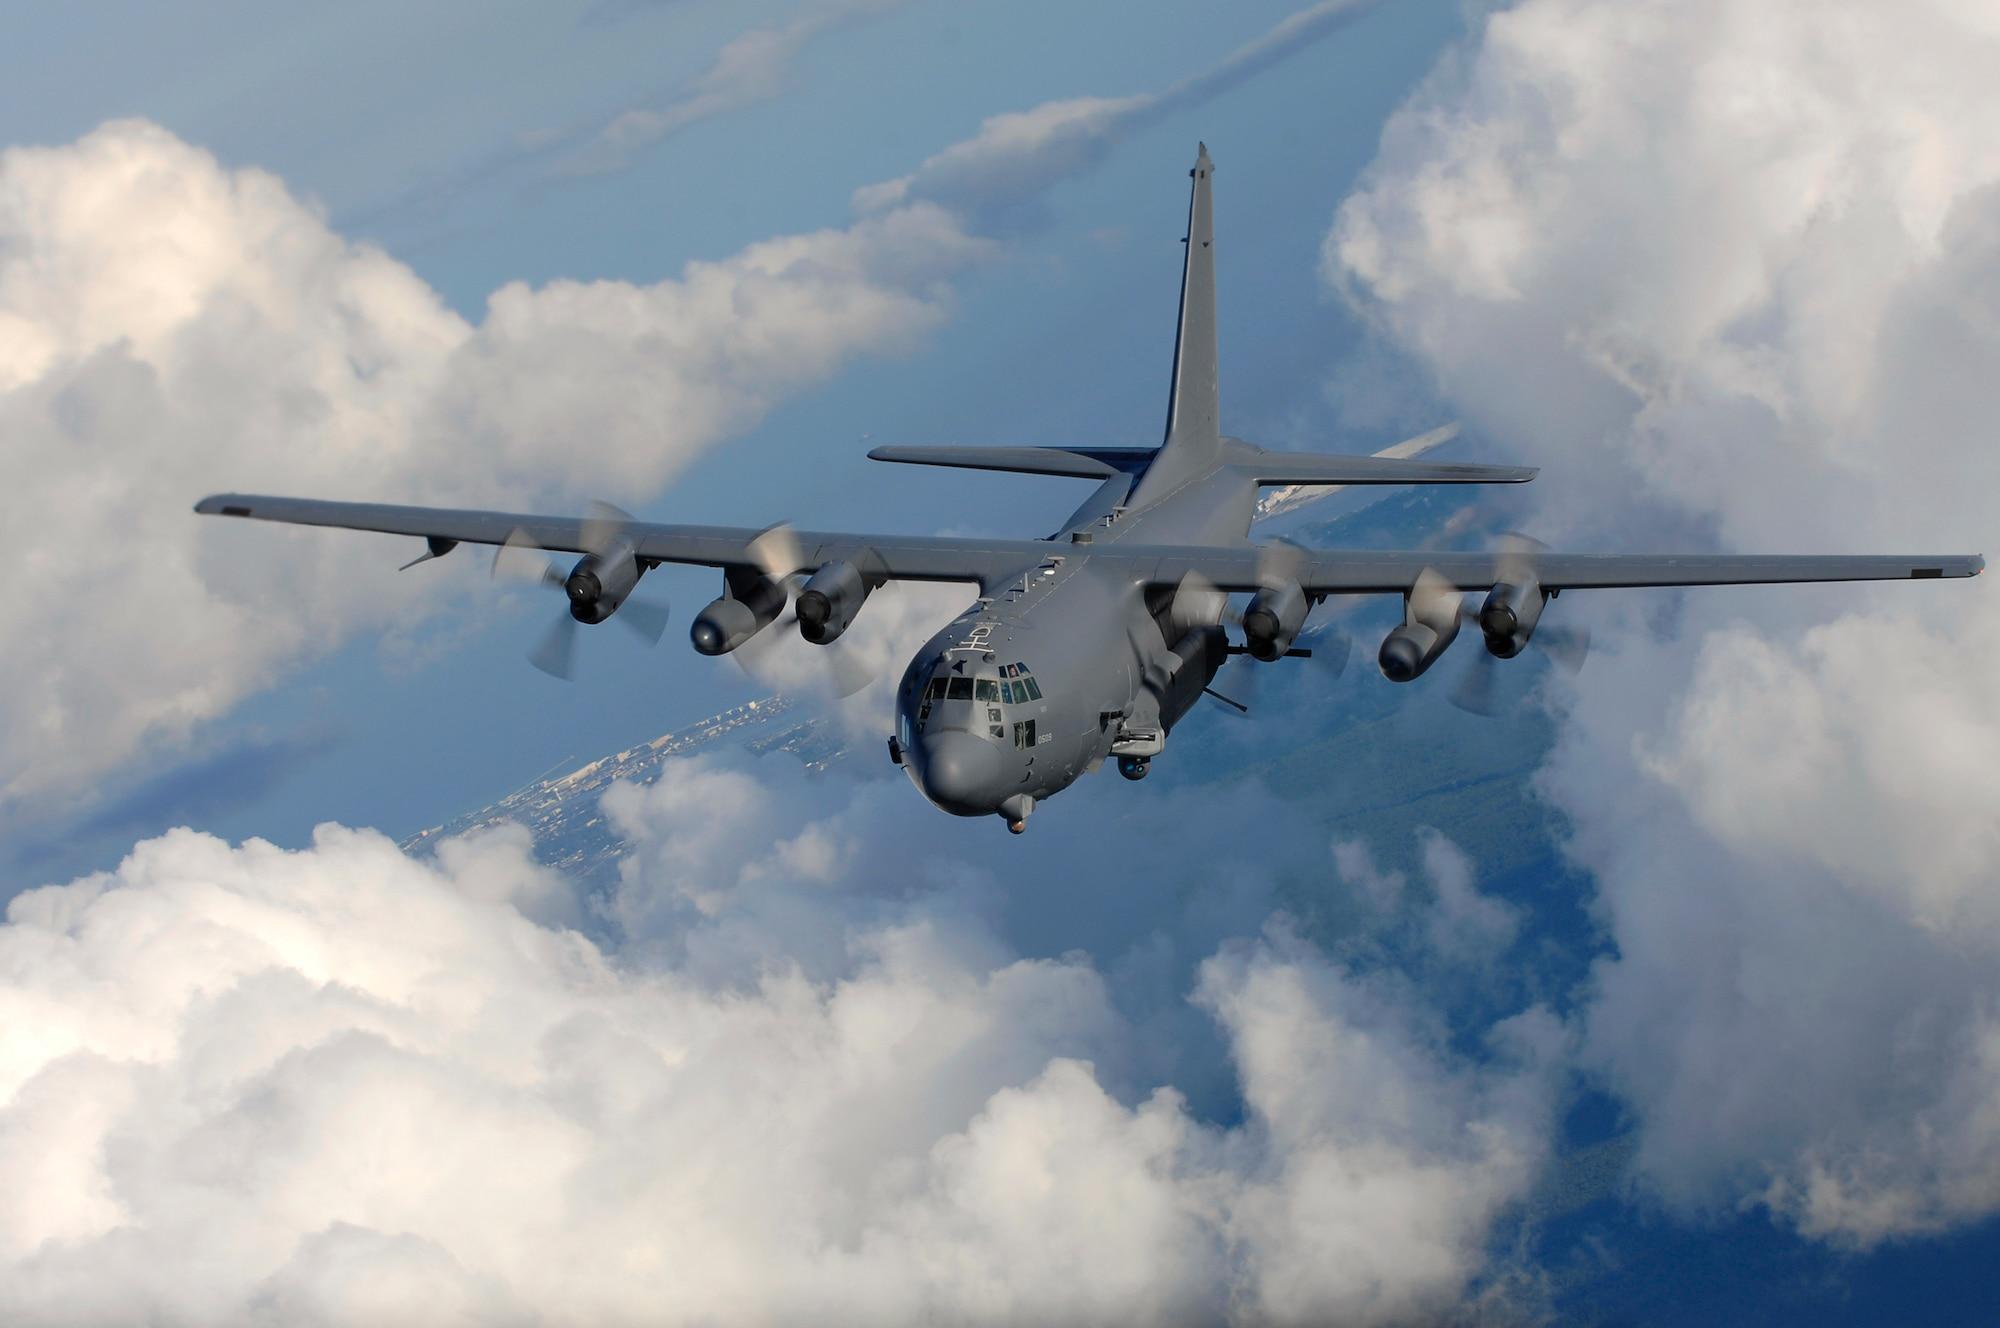 HURLBURT FIELD, Fla. -- An AC-130U gunship from the 4th Special Operations Squadron, flies near Hurlburt Field, Fla., Aug. 20. The AC-130 gunship's primary missions are close air support, air interdiction and force protection. (U.S. Air Force photo/ Senior Airman Julianne Showalter)